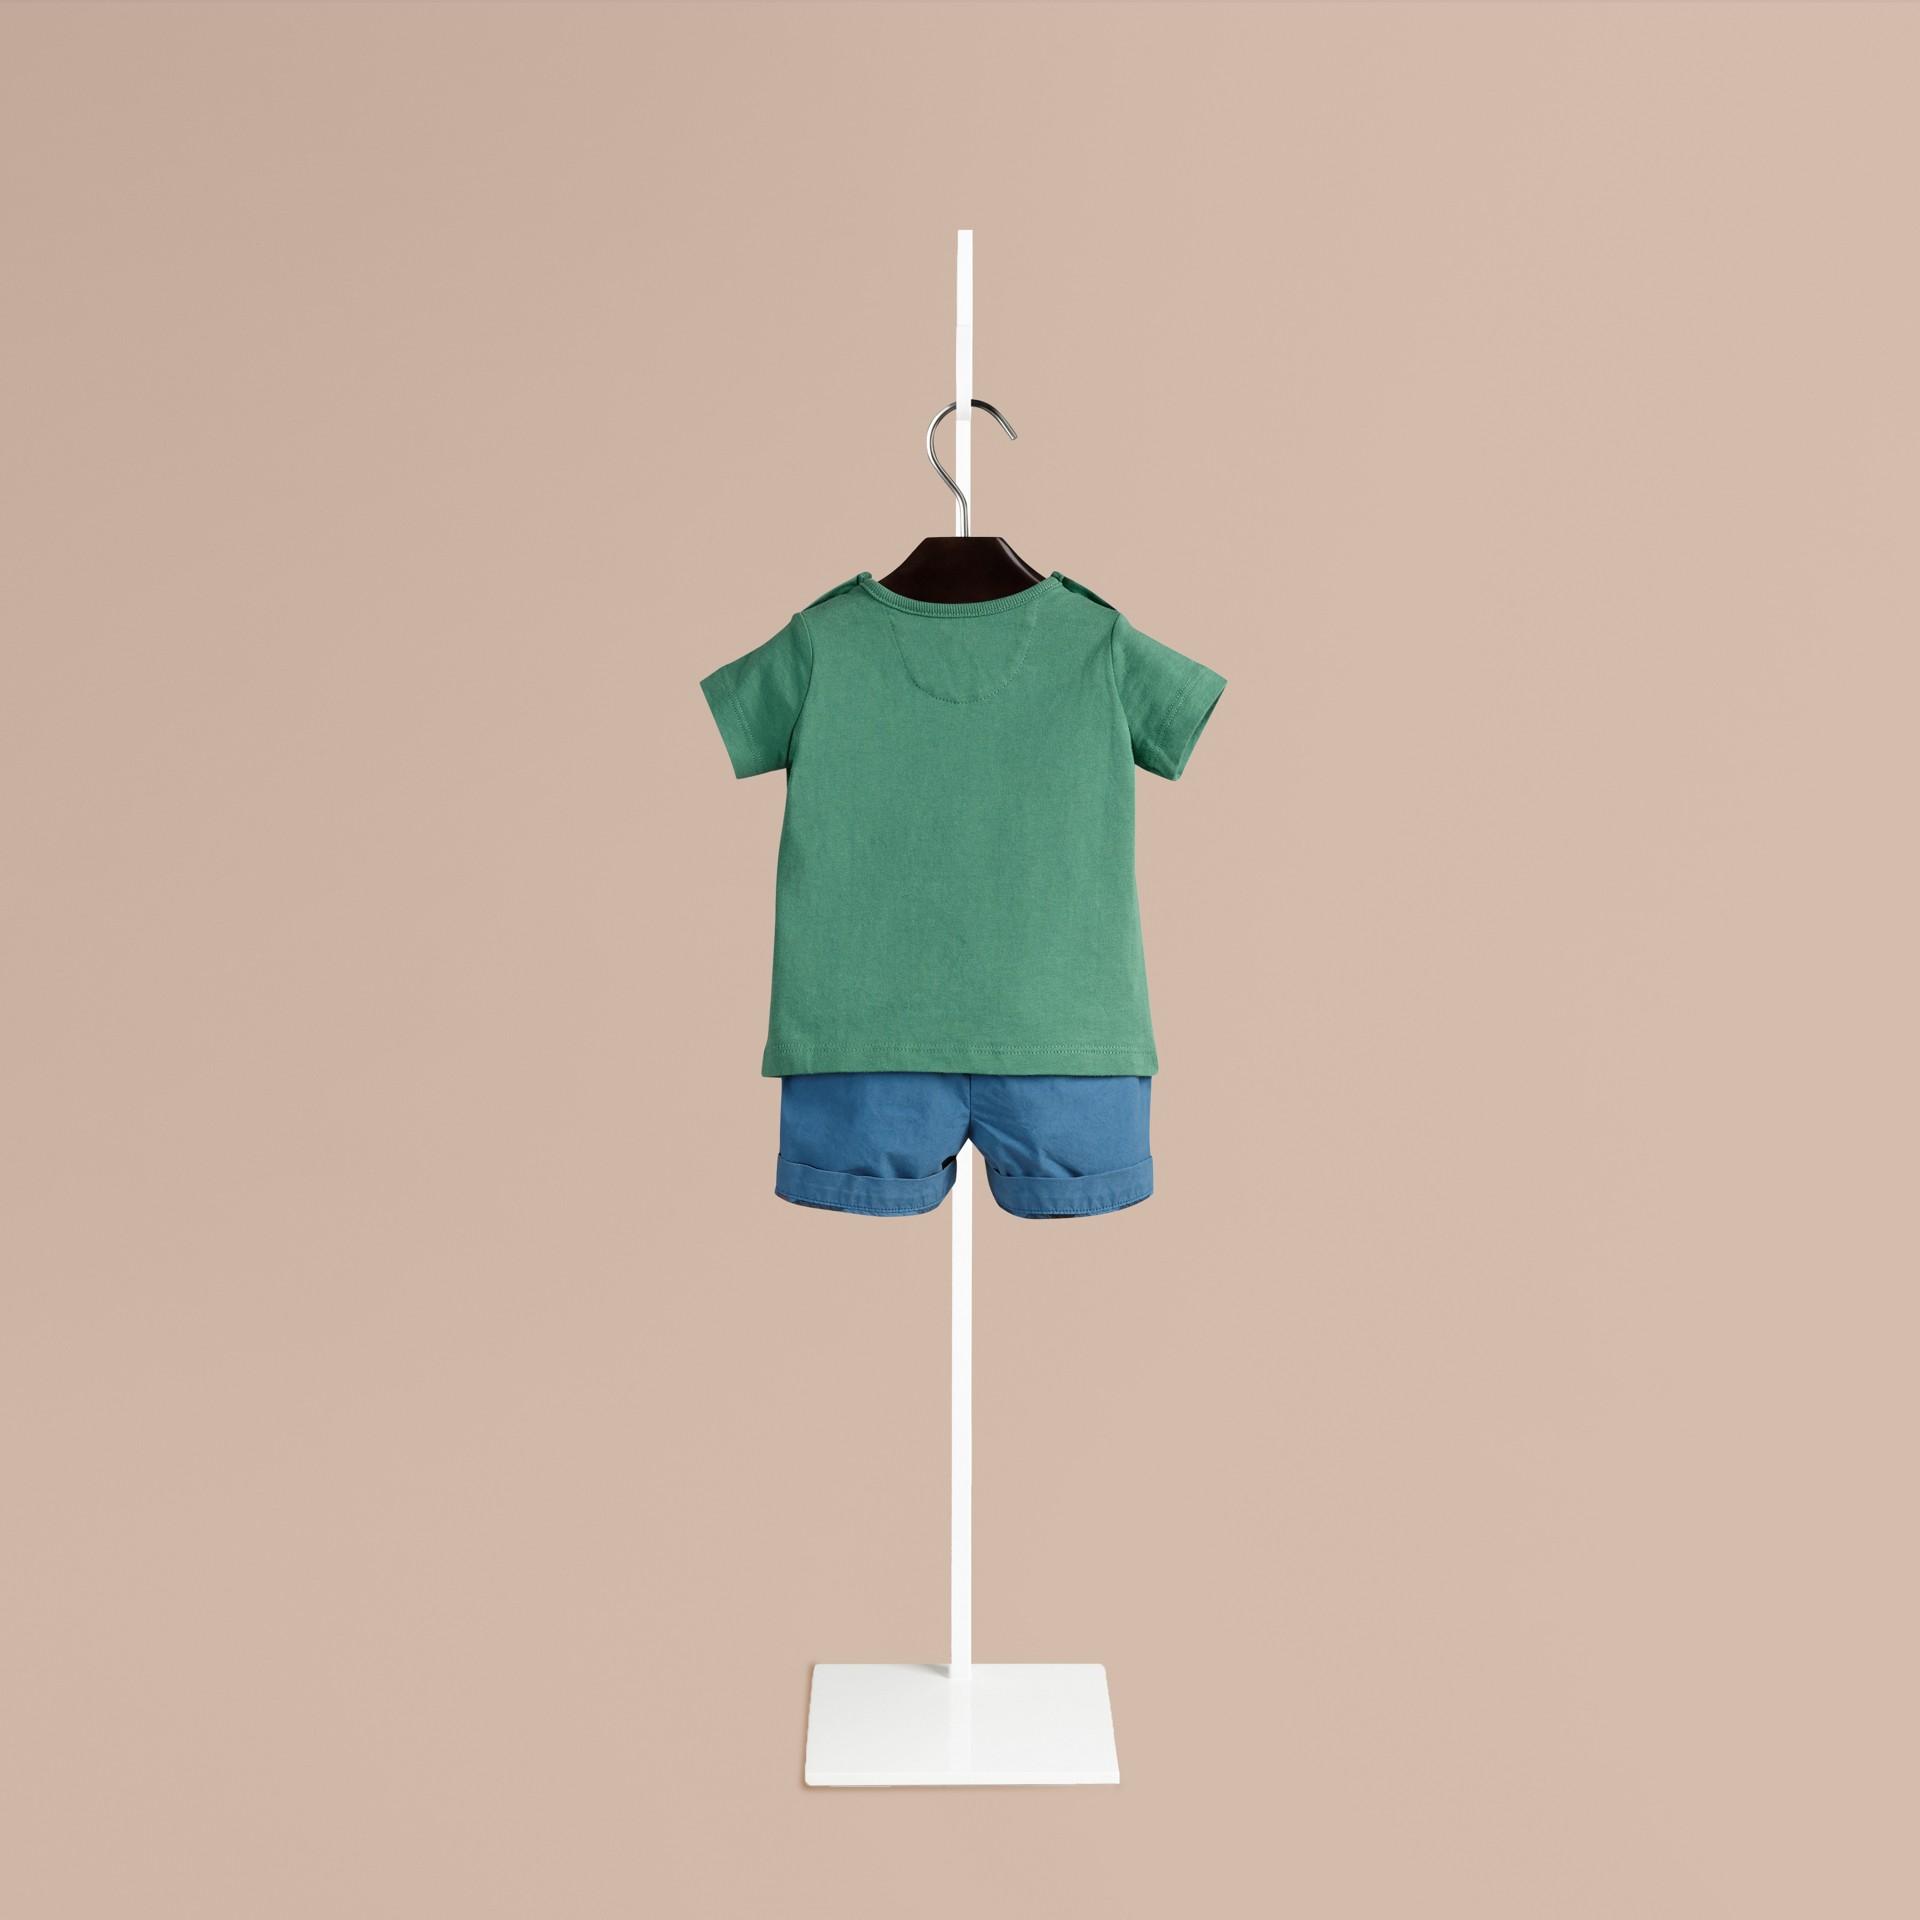 Sturmgrün Baumwoll-T-Shirt mit Gepardmotiv Sturmgrün - Galerie-Bild 2